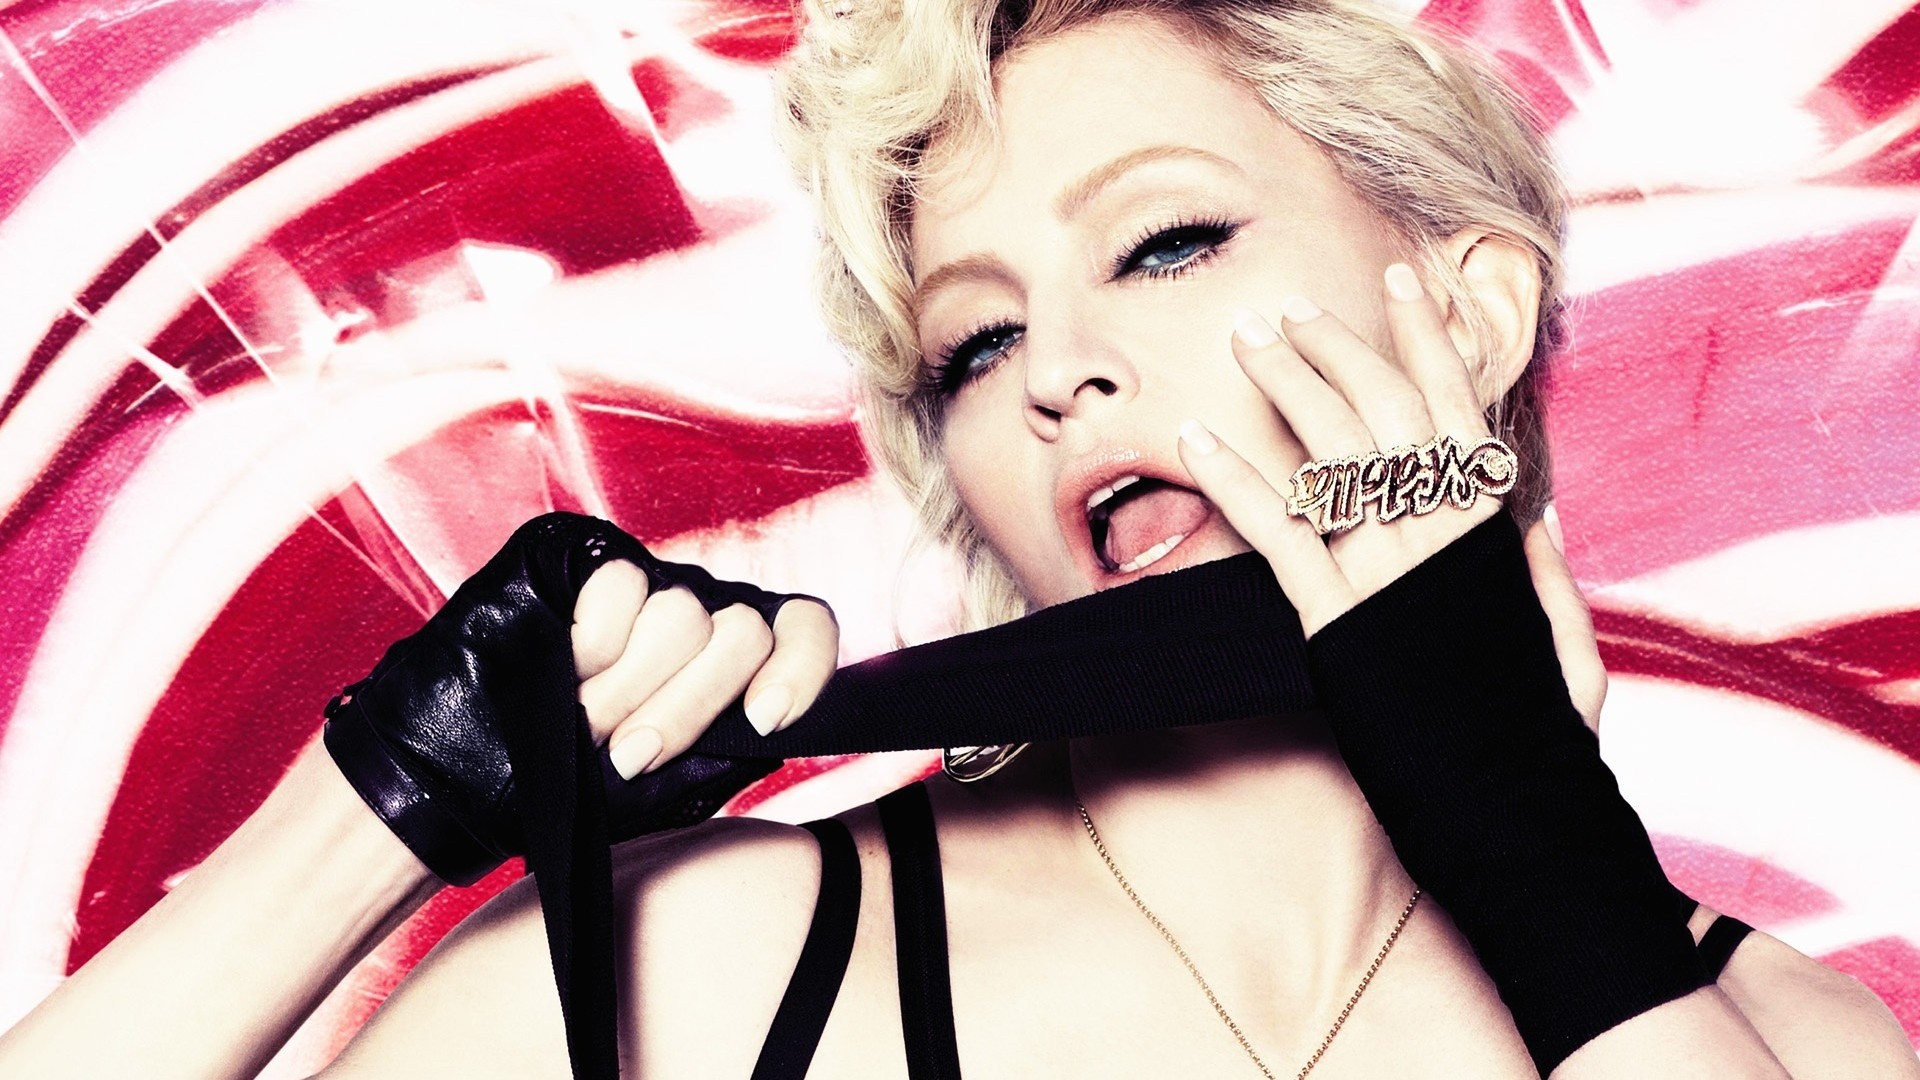 immagine desktop cantante madonna gratis